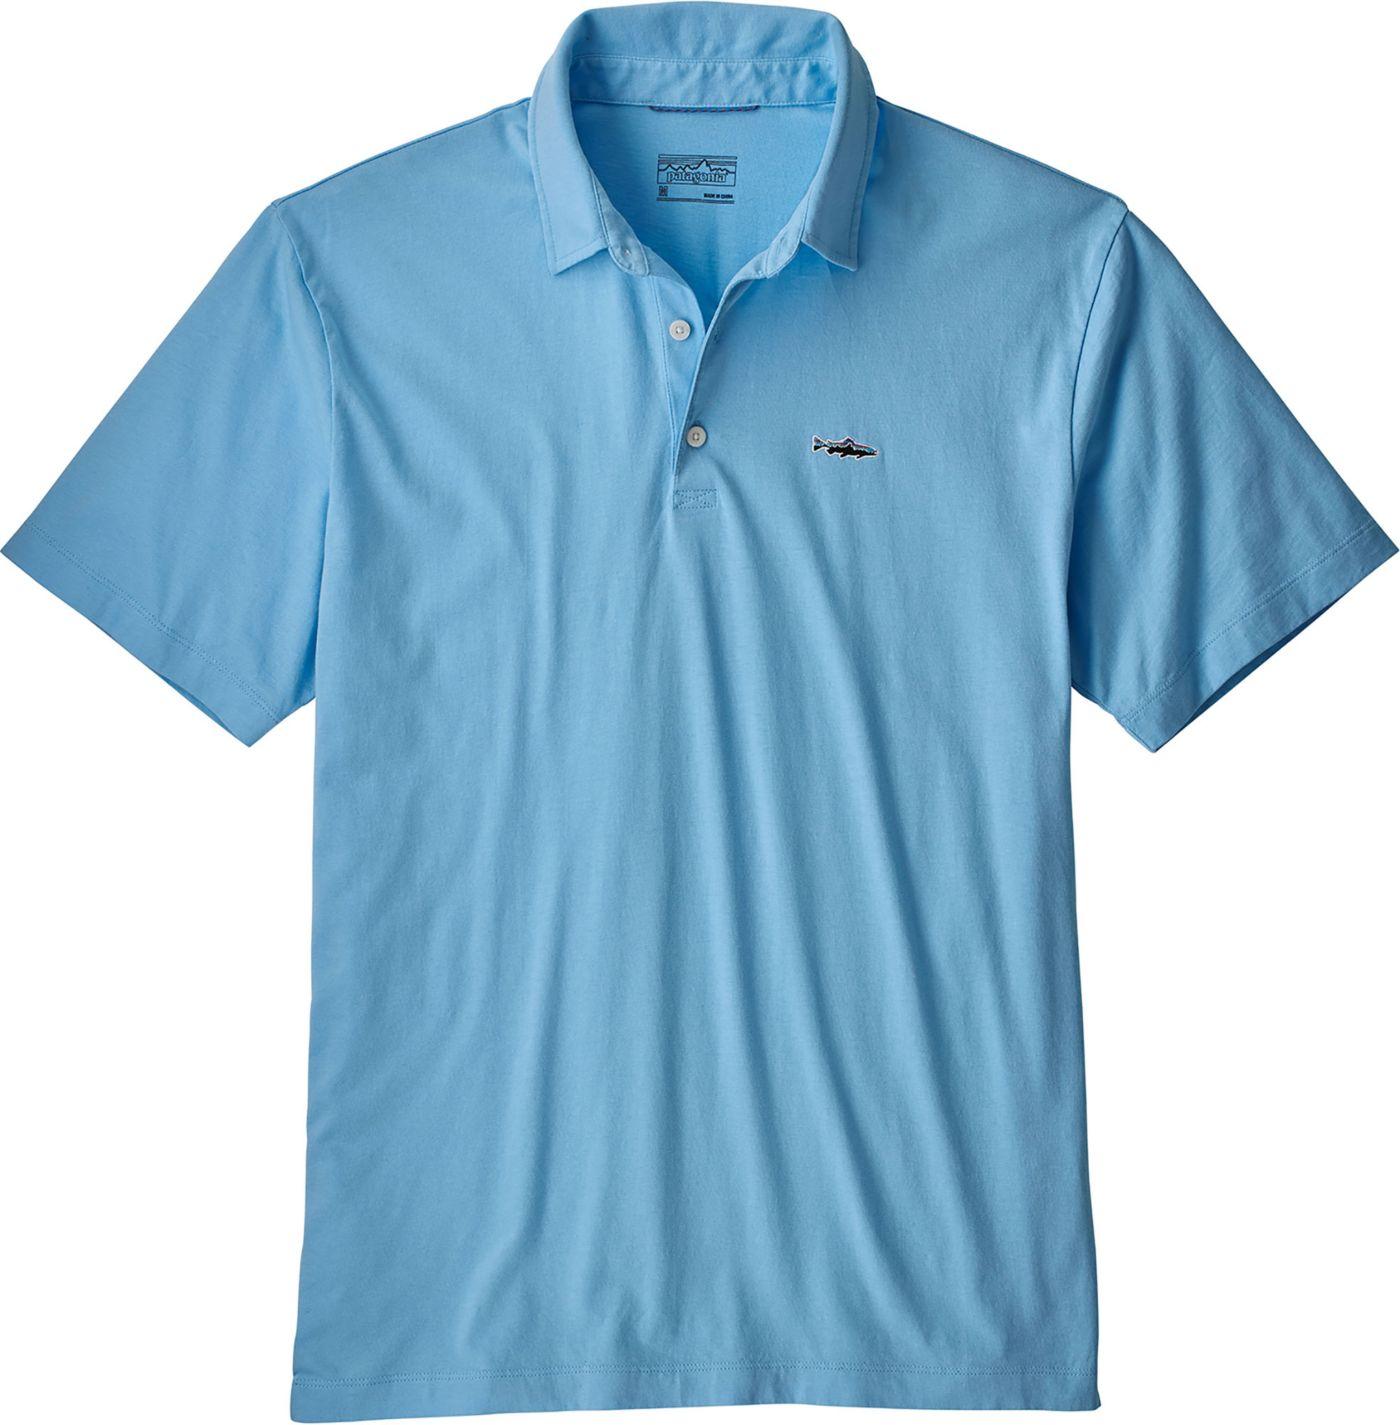 Patagonia Men's Trout Fitz Roy Polo Shirt